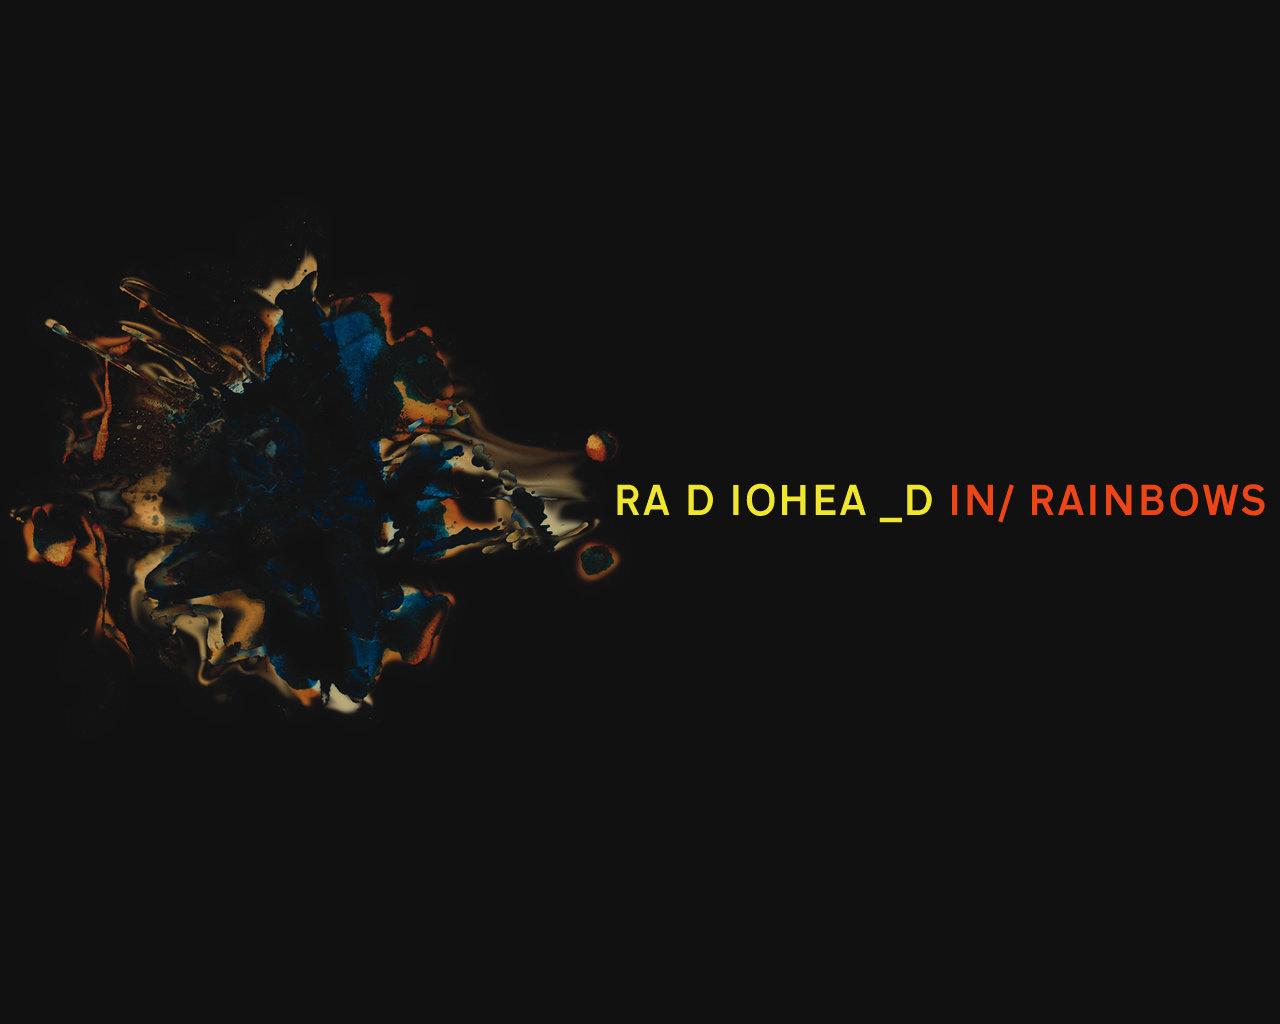 Radiohead Wallpapers Hd For Desktop Backgrounds